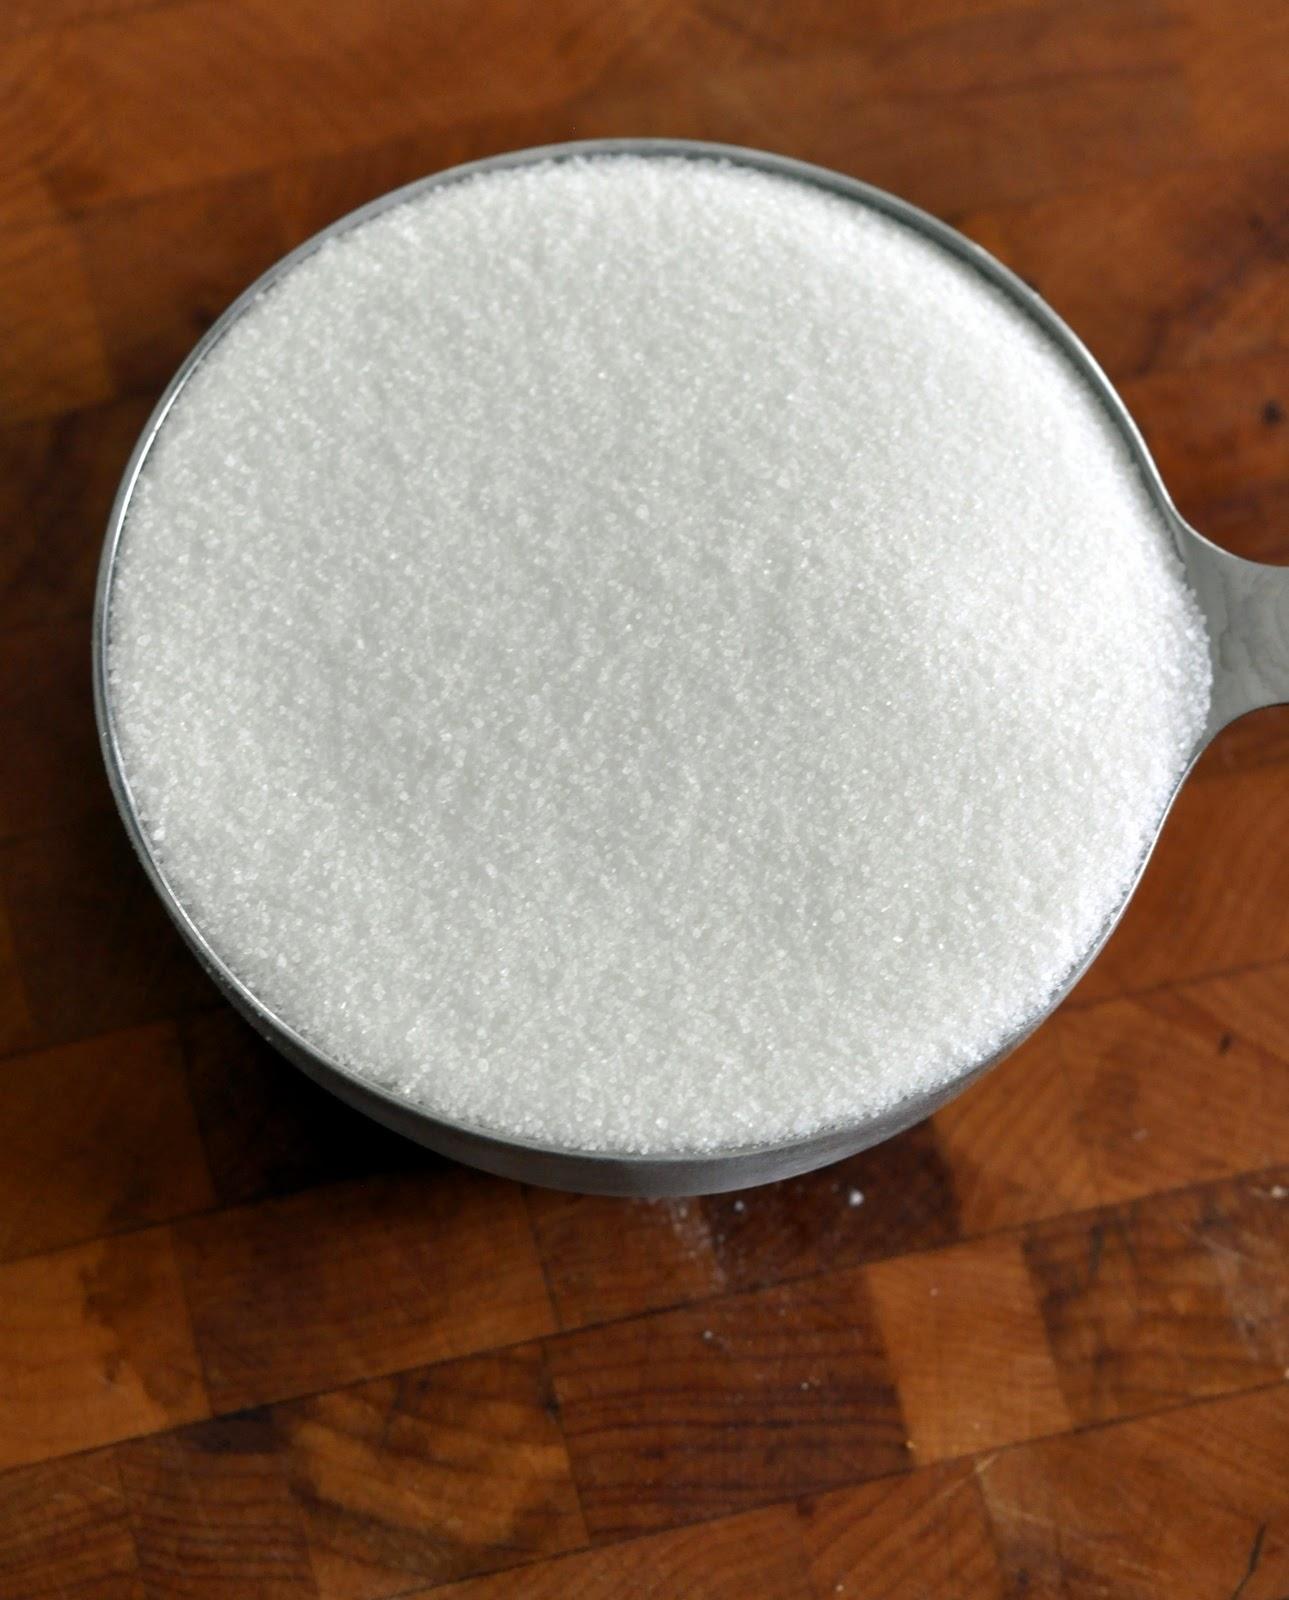 Granulated-Sugar-tasteasyougo.com